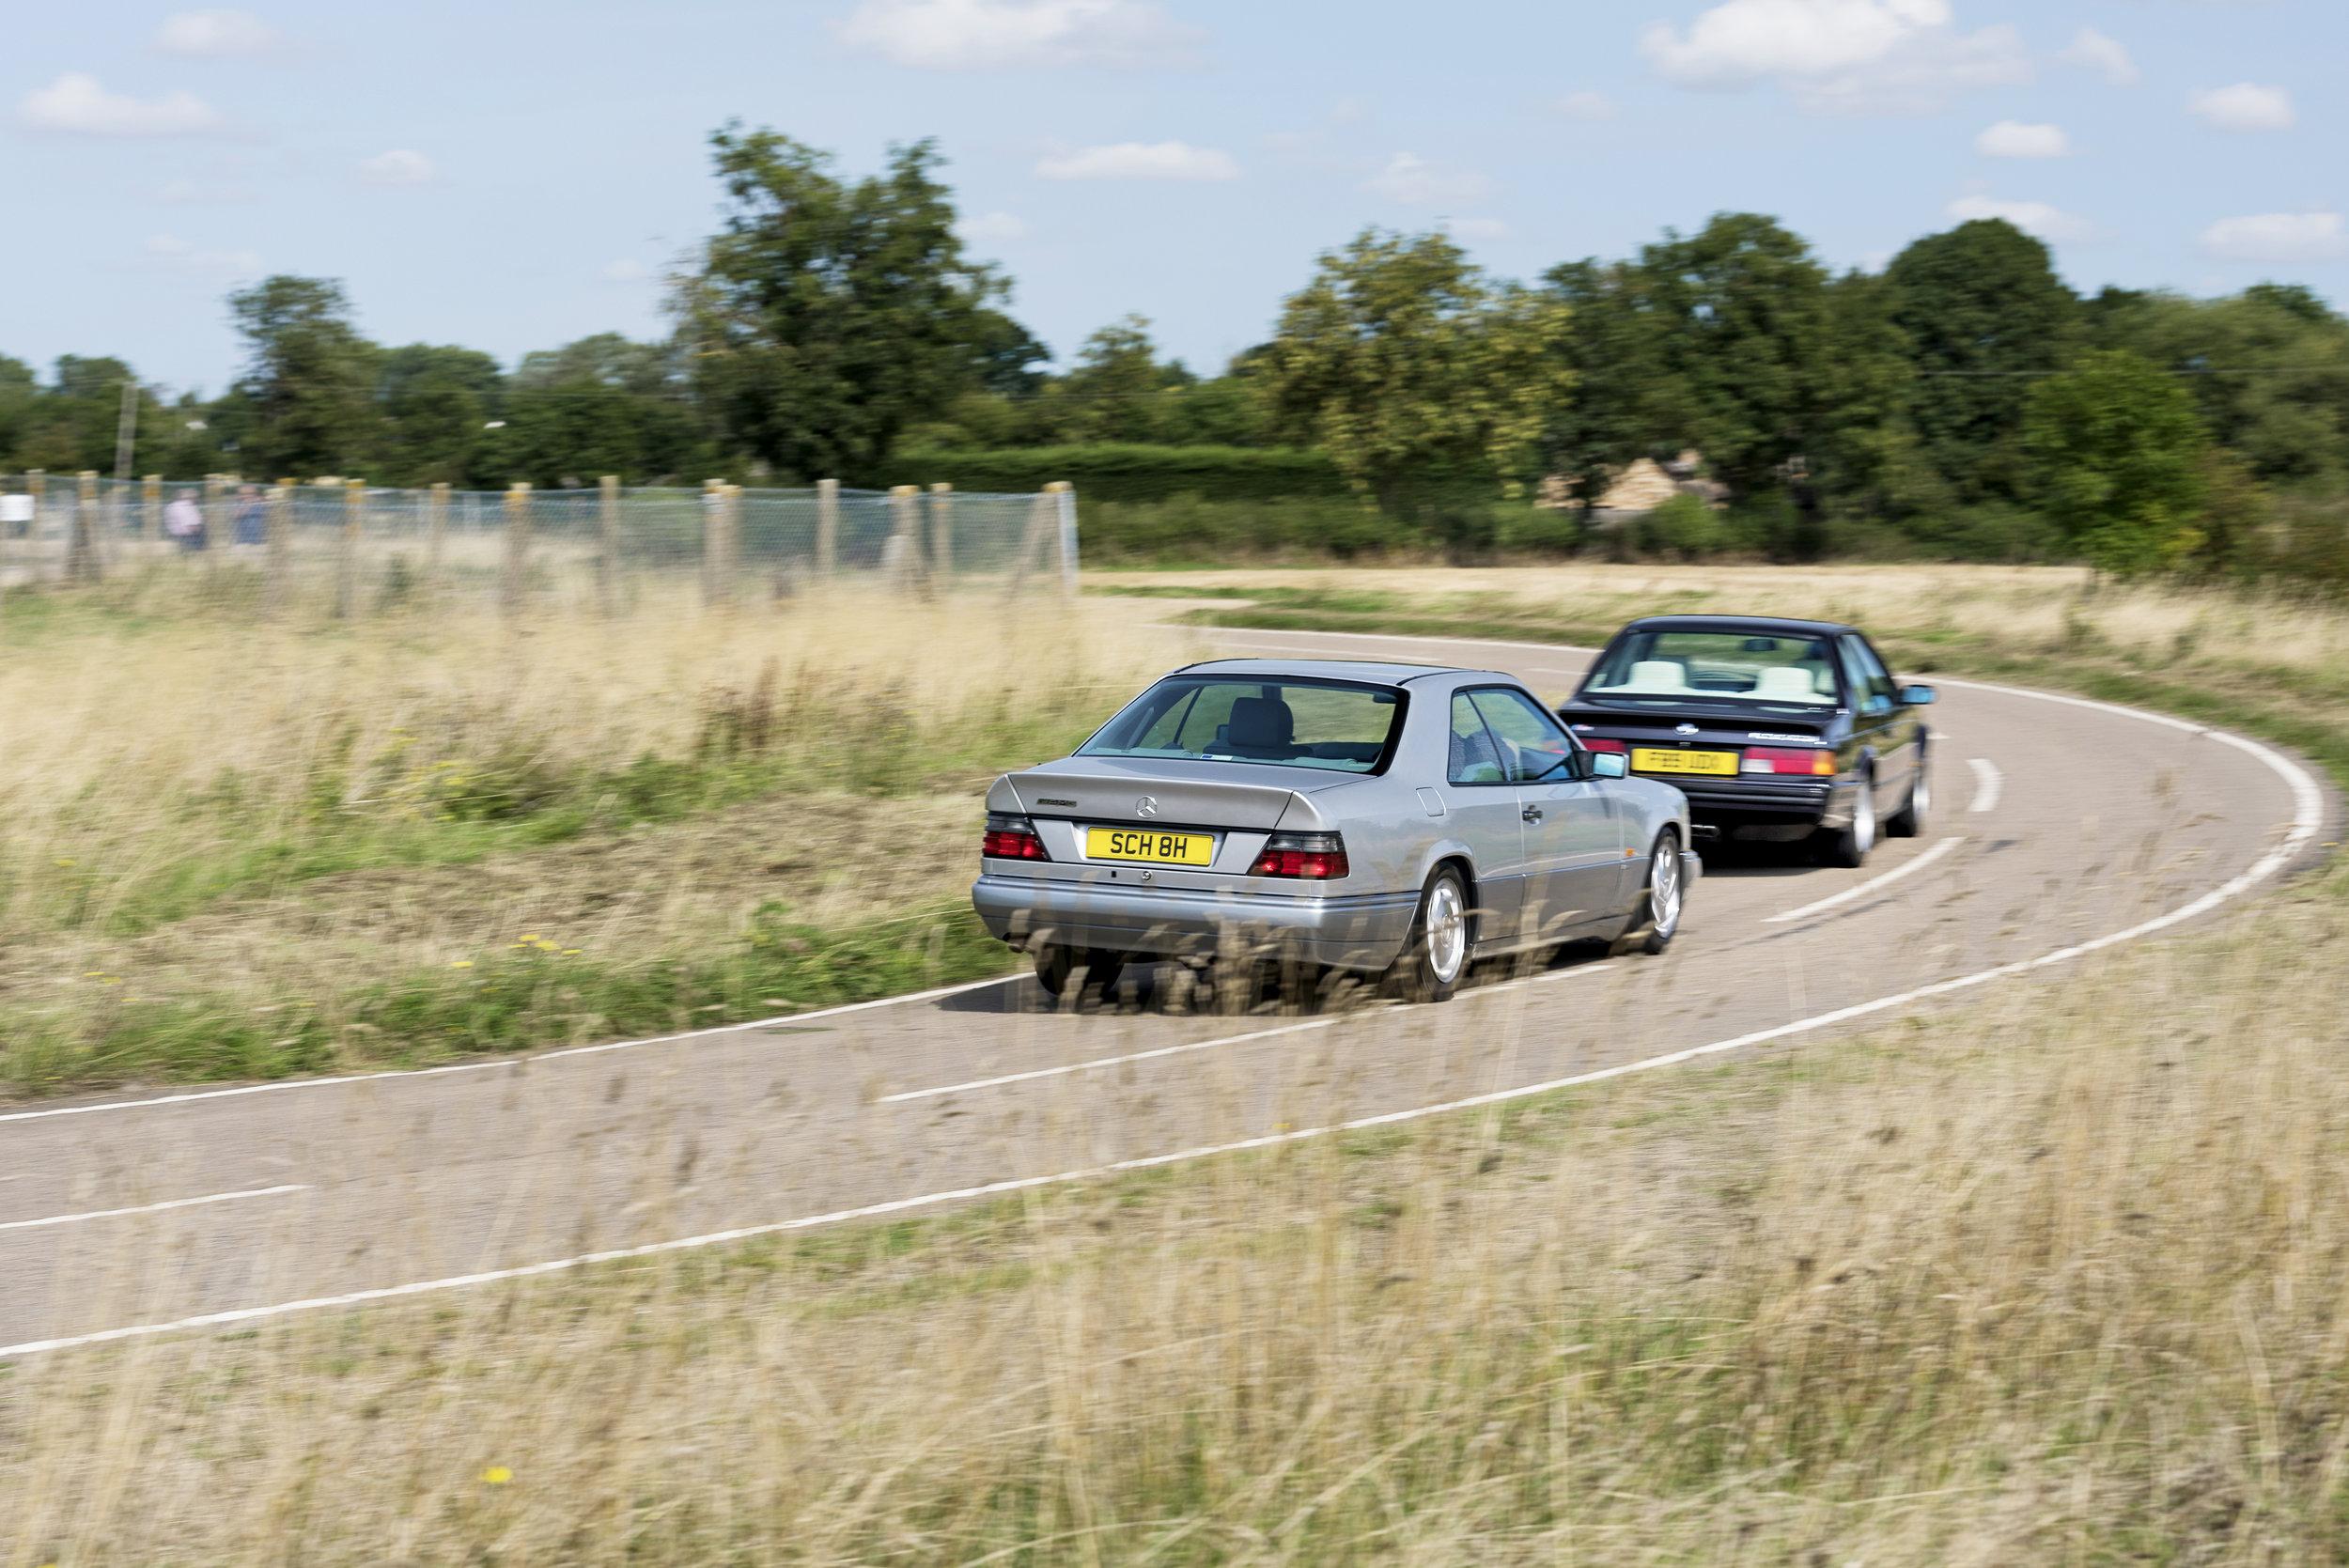 modernclassics-BMW-635i-Mercedes-E320-jordanbutters-73.jpg